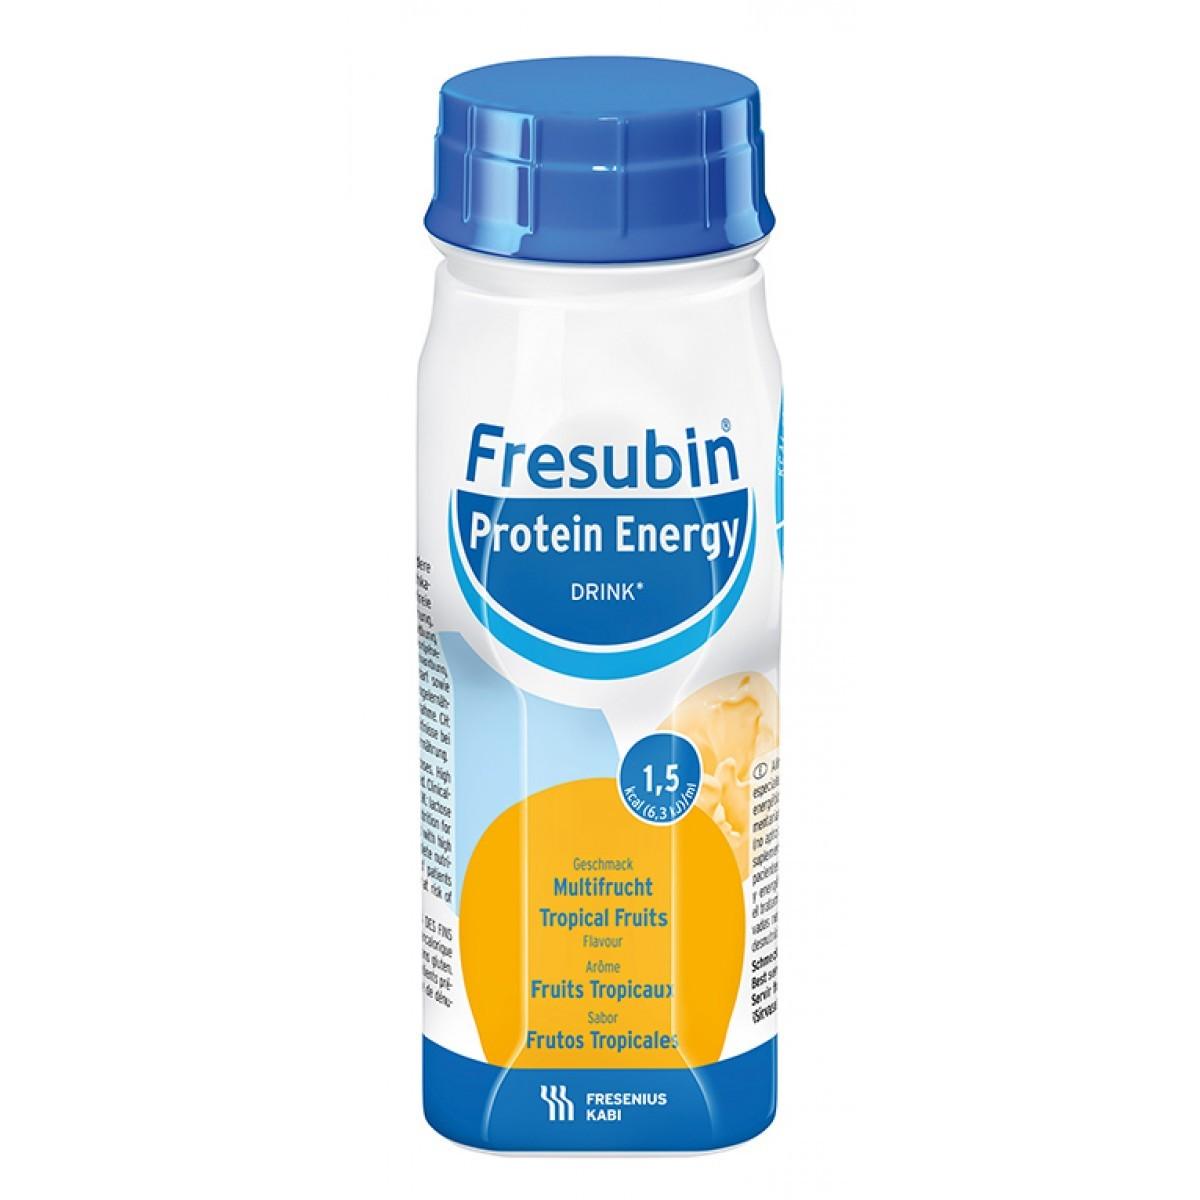 Fresubin Protein Energy Drink Abacaxi - 200 mL - (FRESENIUS KABI BRASIL LTDA)